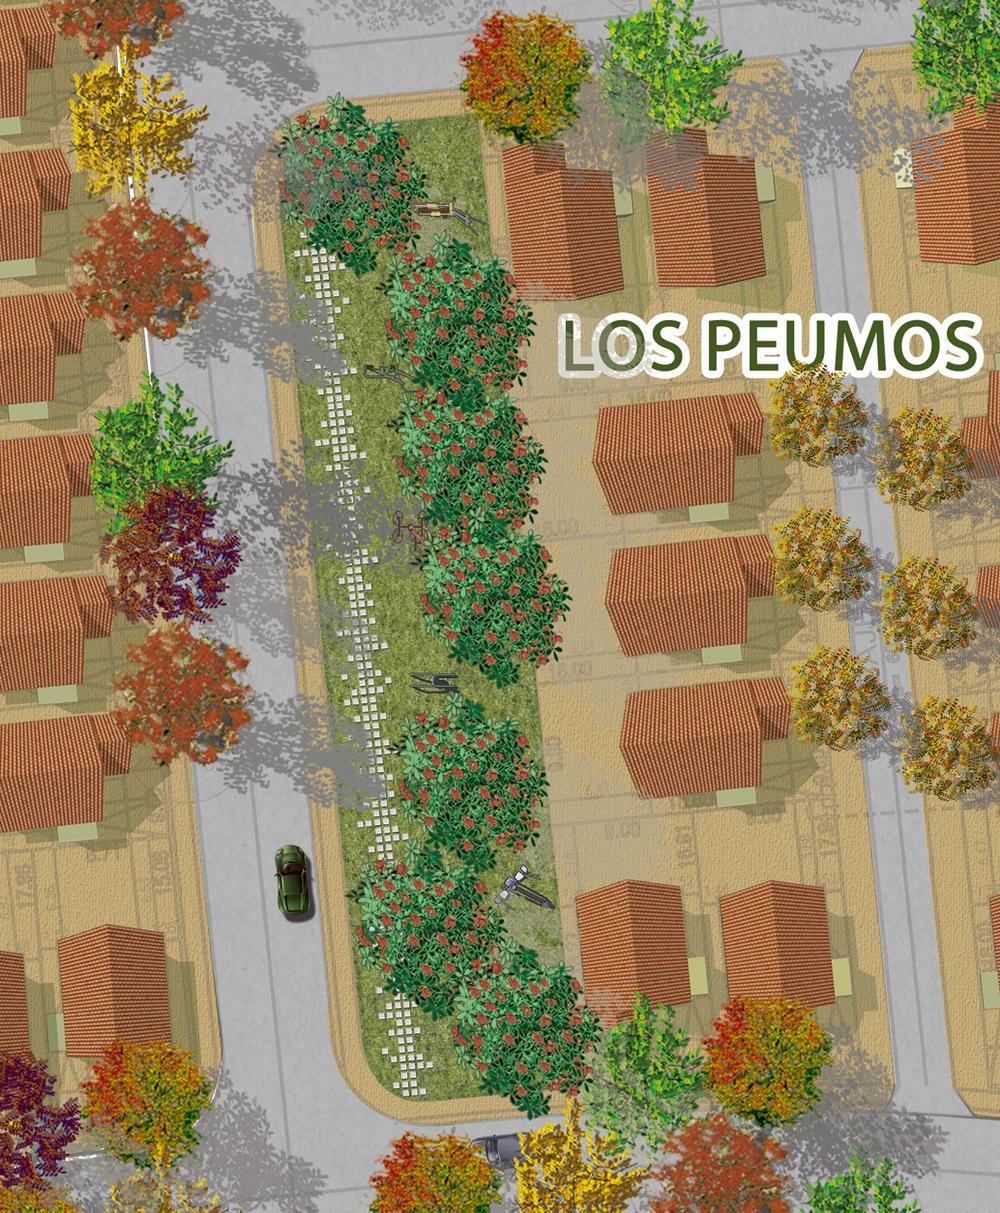 Plaza Los Maitenes